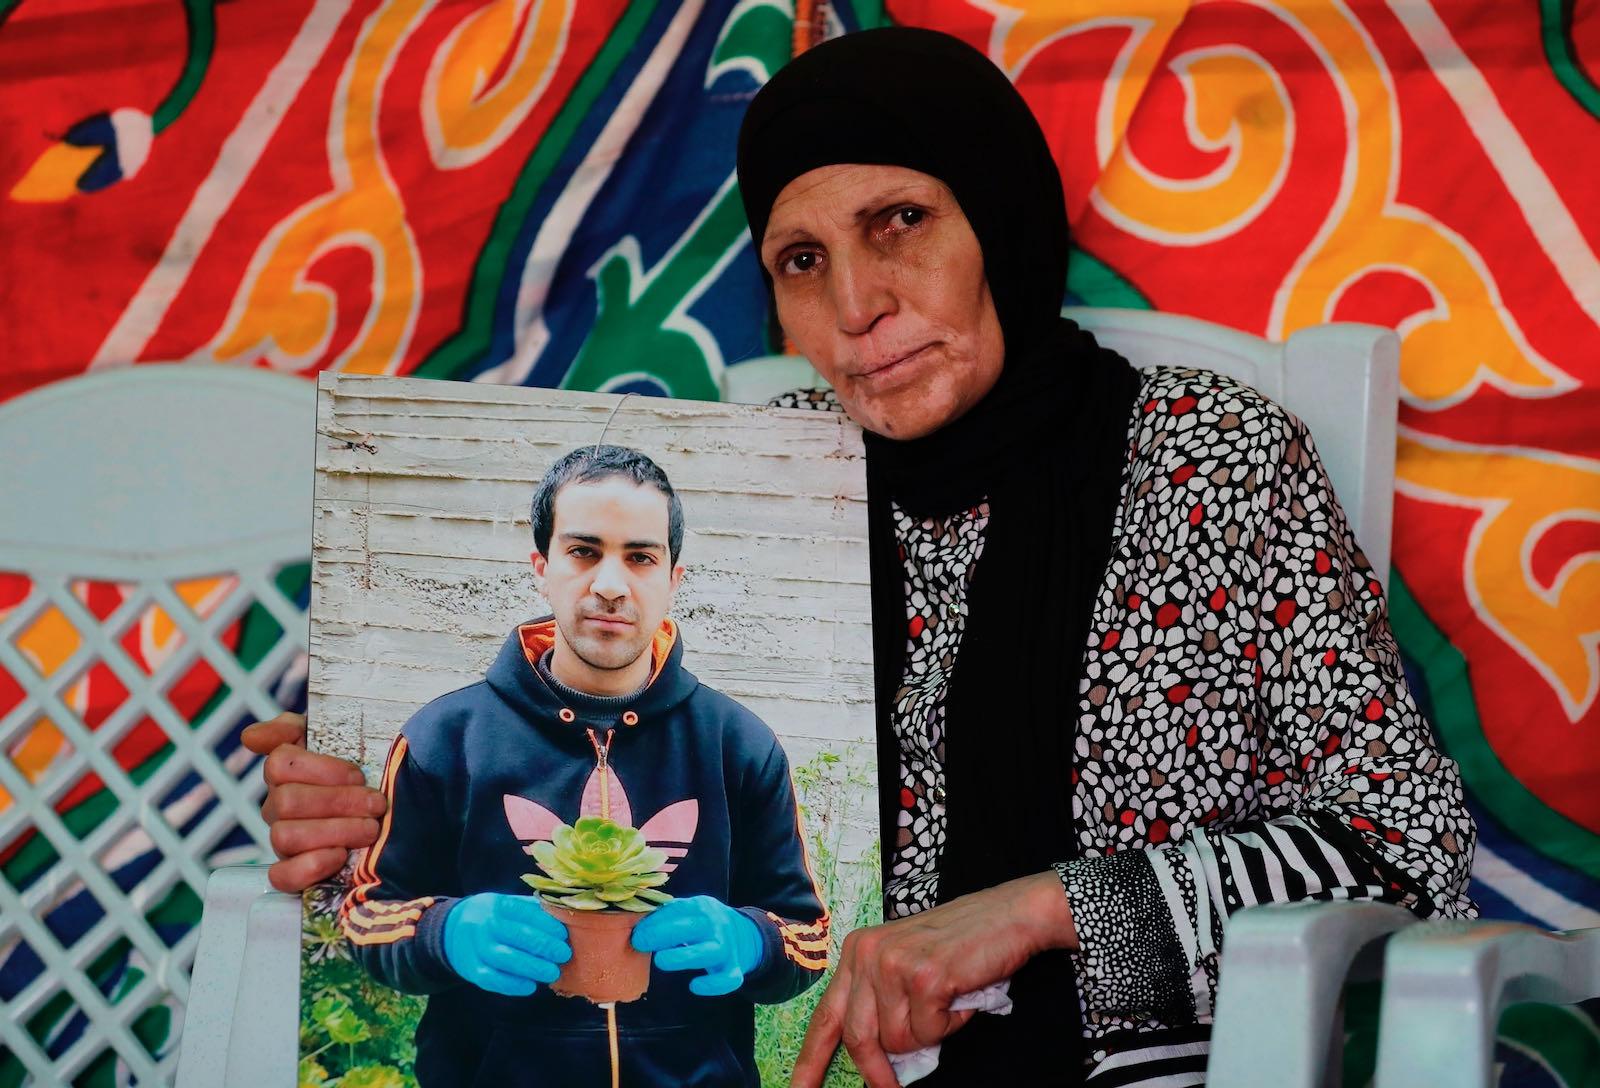 Rana al-Hallaq mourning her son, Eyad